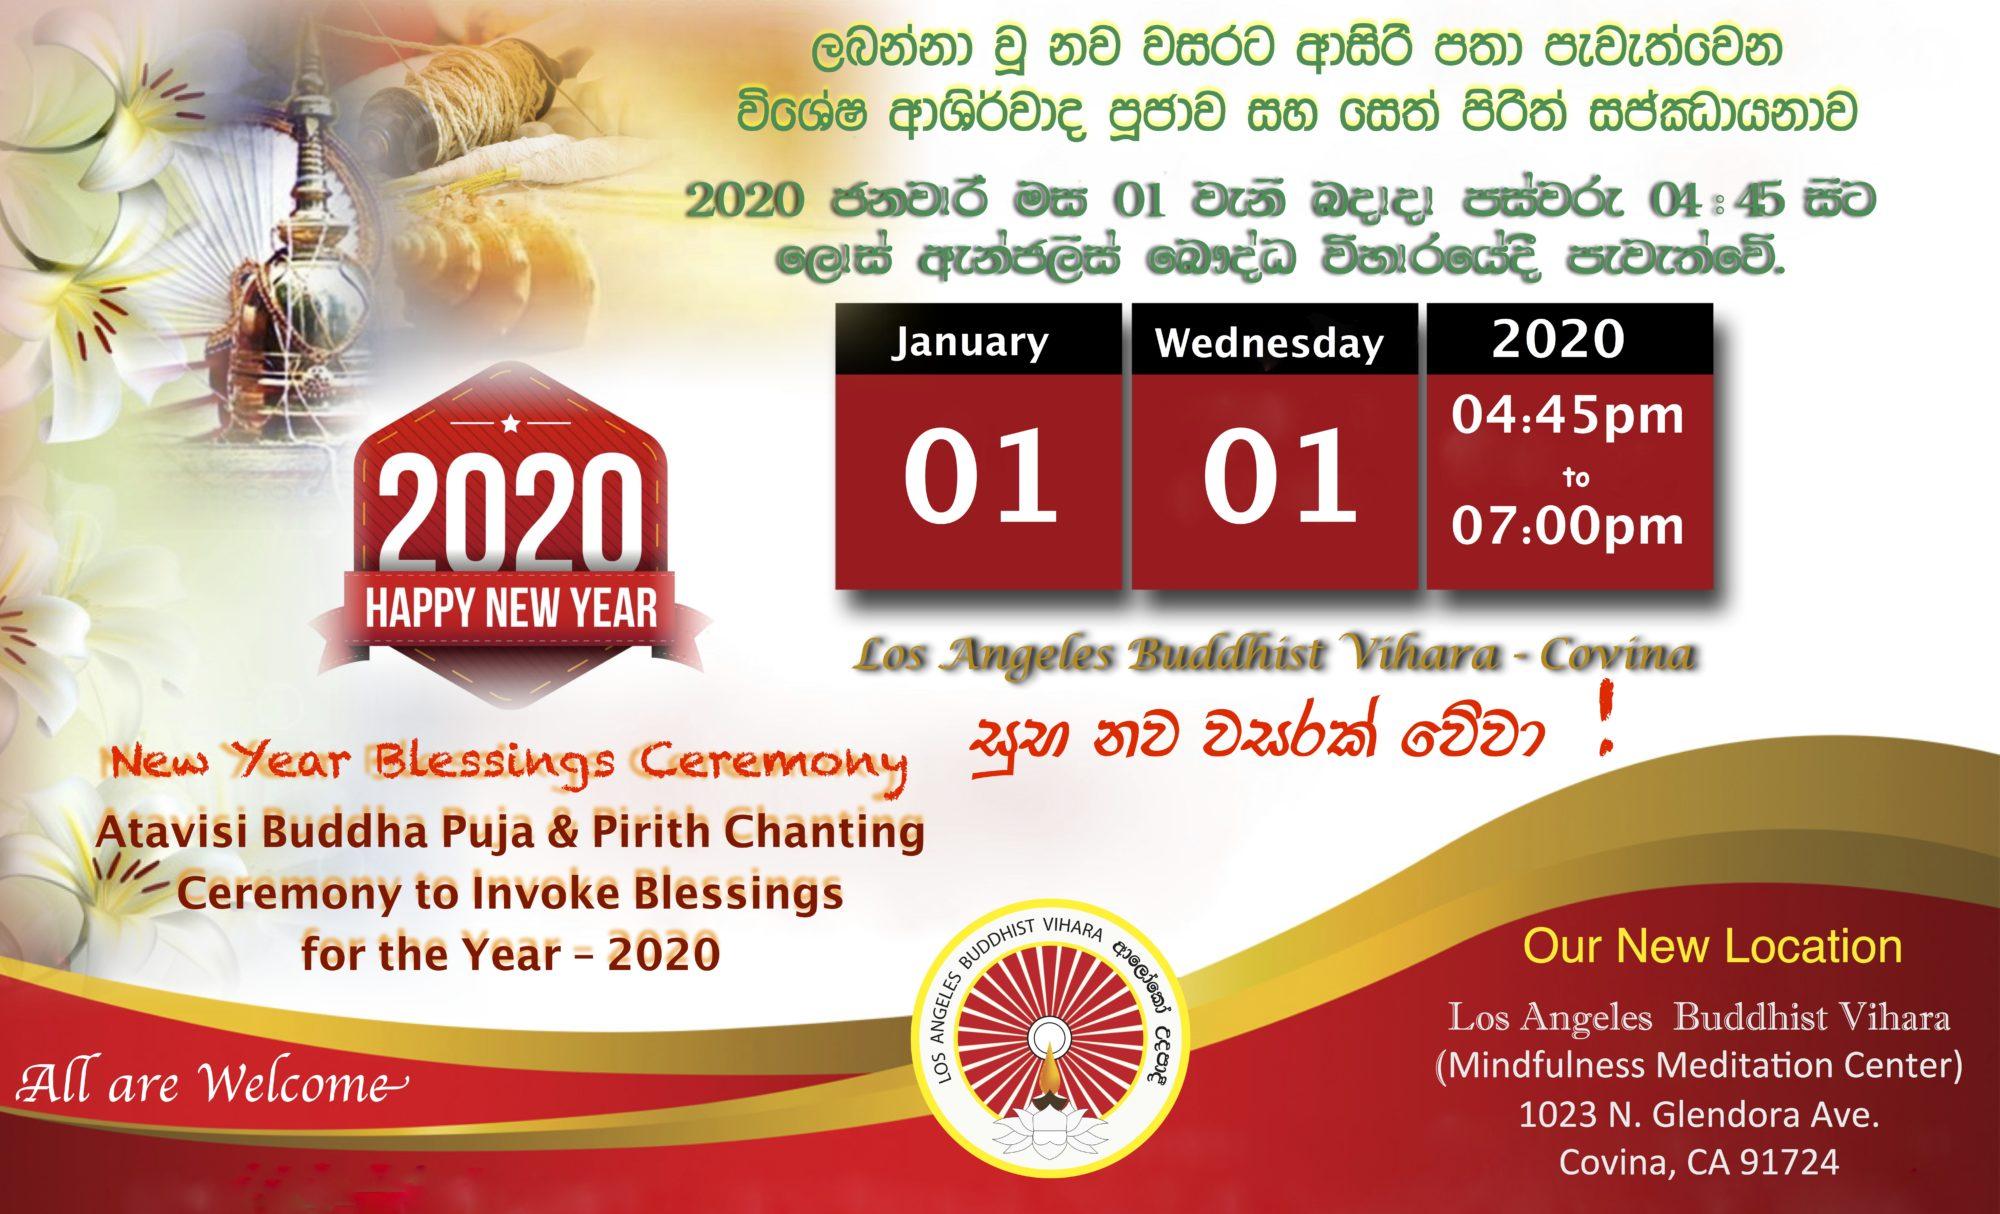 ATAVISI BUDDHA PUJA & PIRITH CHANTING